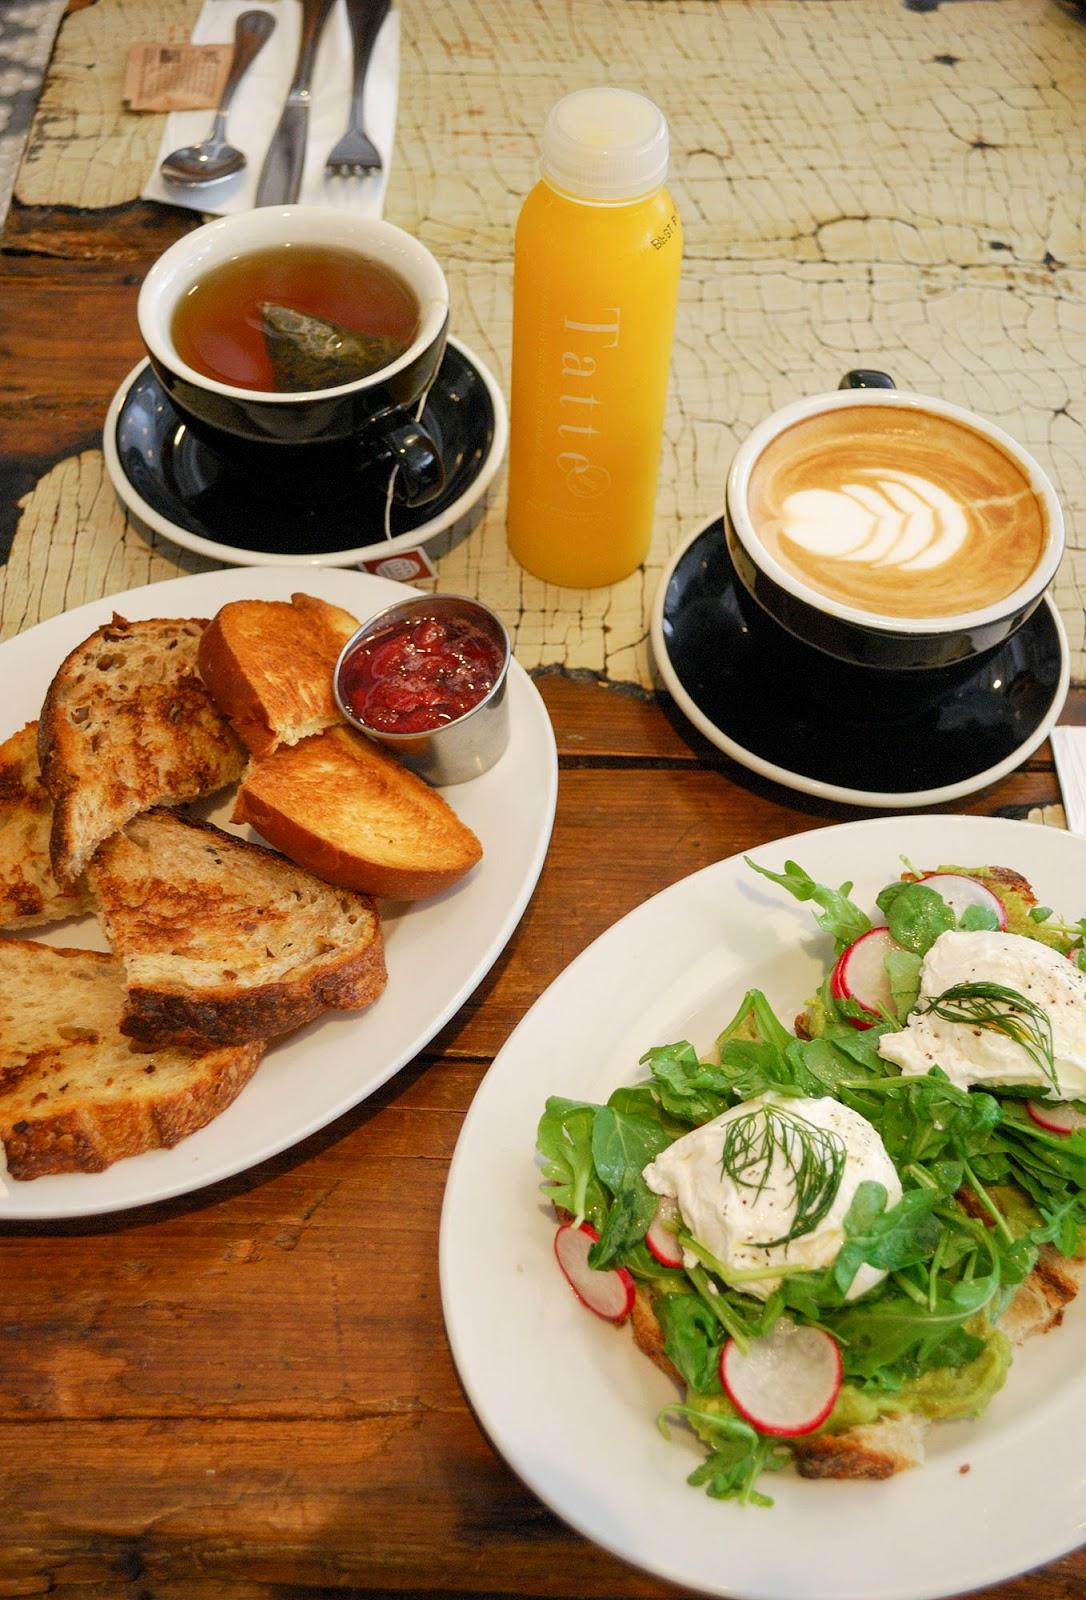 boston tatte bakery breakfast brunch coffee brekky itinerary plan guide tourism usa america park east coast